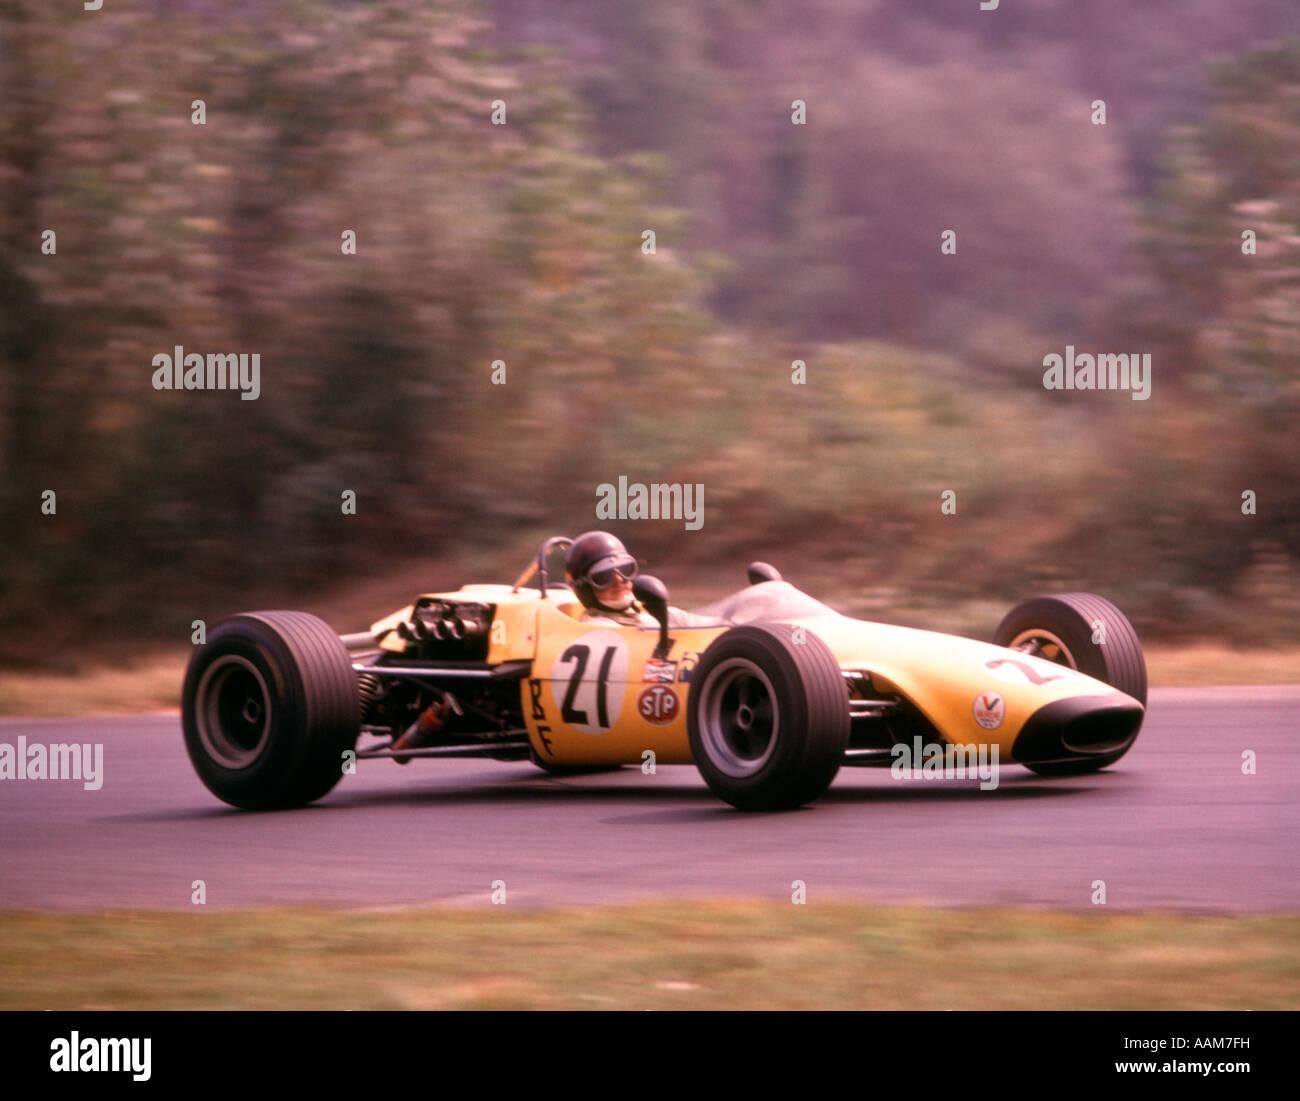 Yellow Sports Race Racing Car Driver Black Helmet